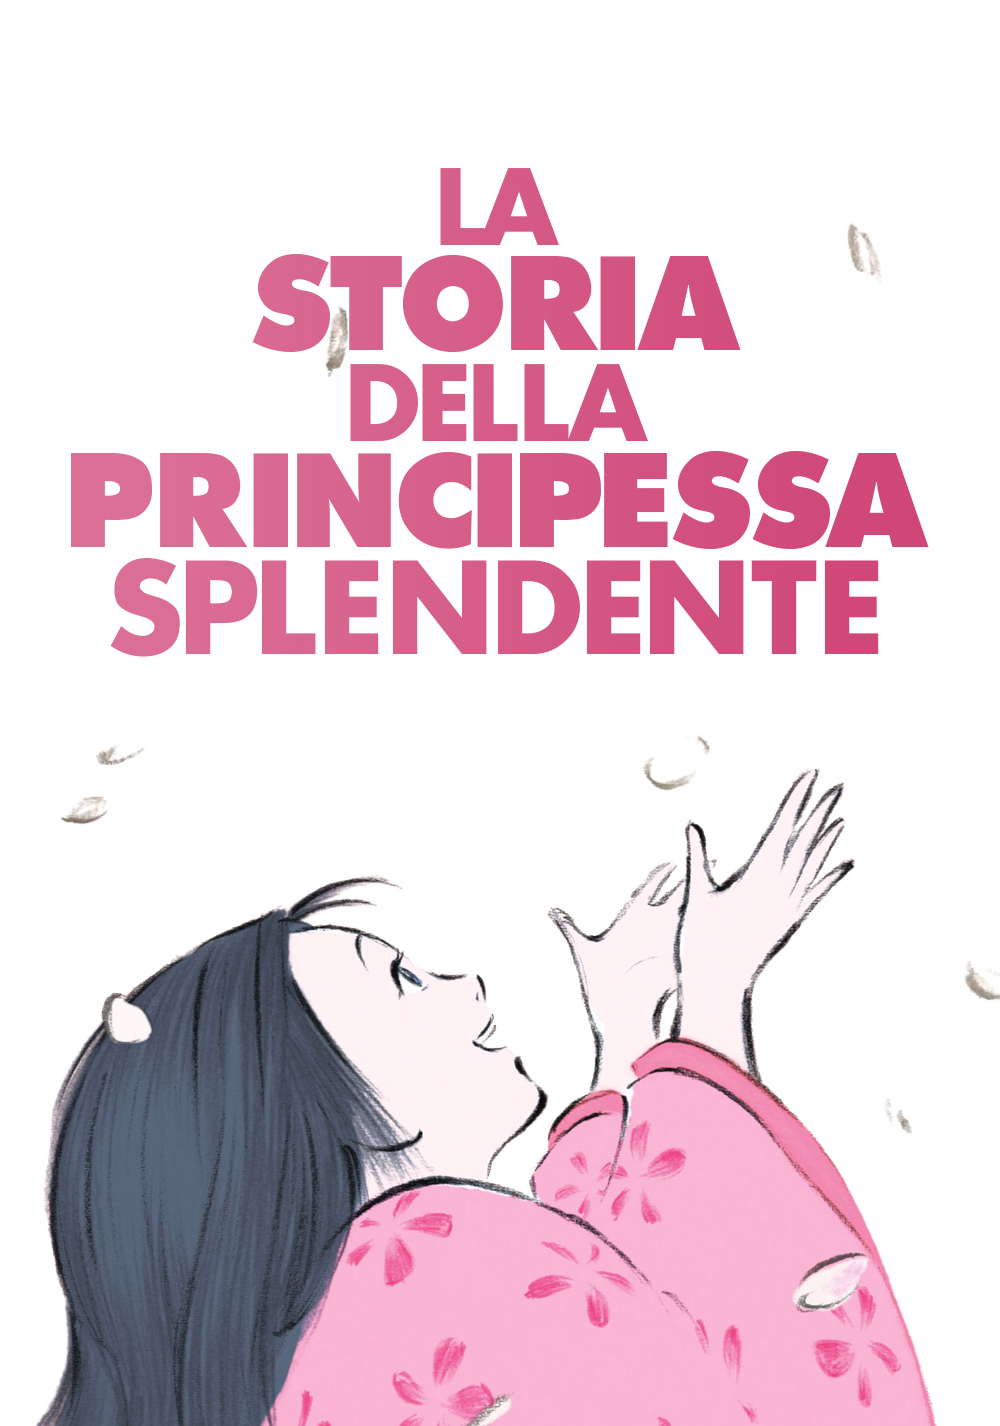 The Tale of Princess Kaguya   Movie fanart   fanart.tv The Tale Of Princess Kaguya Poster